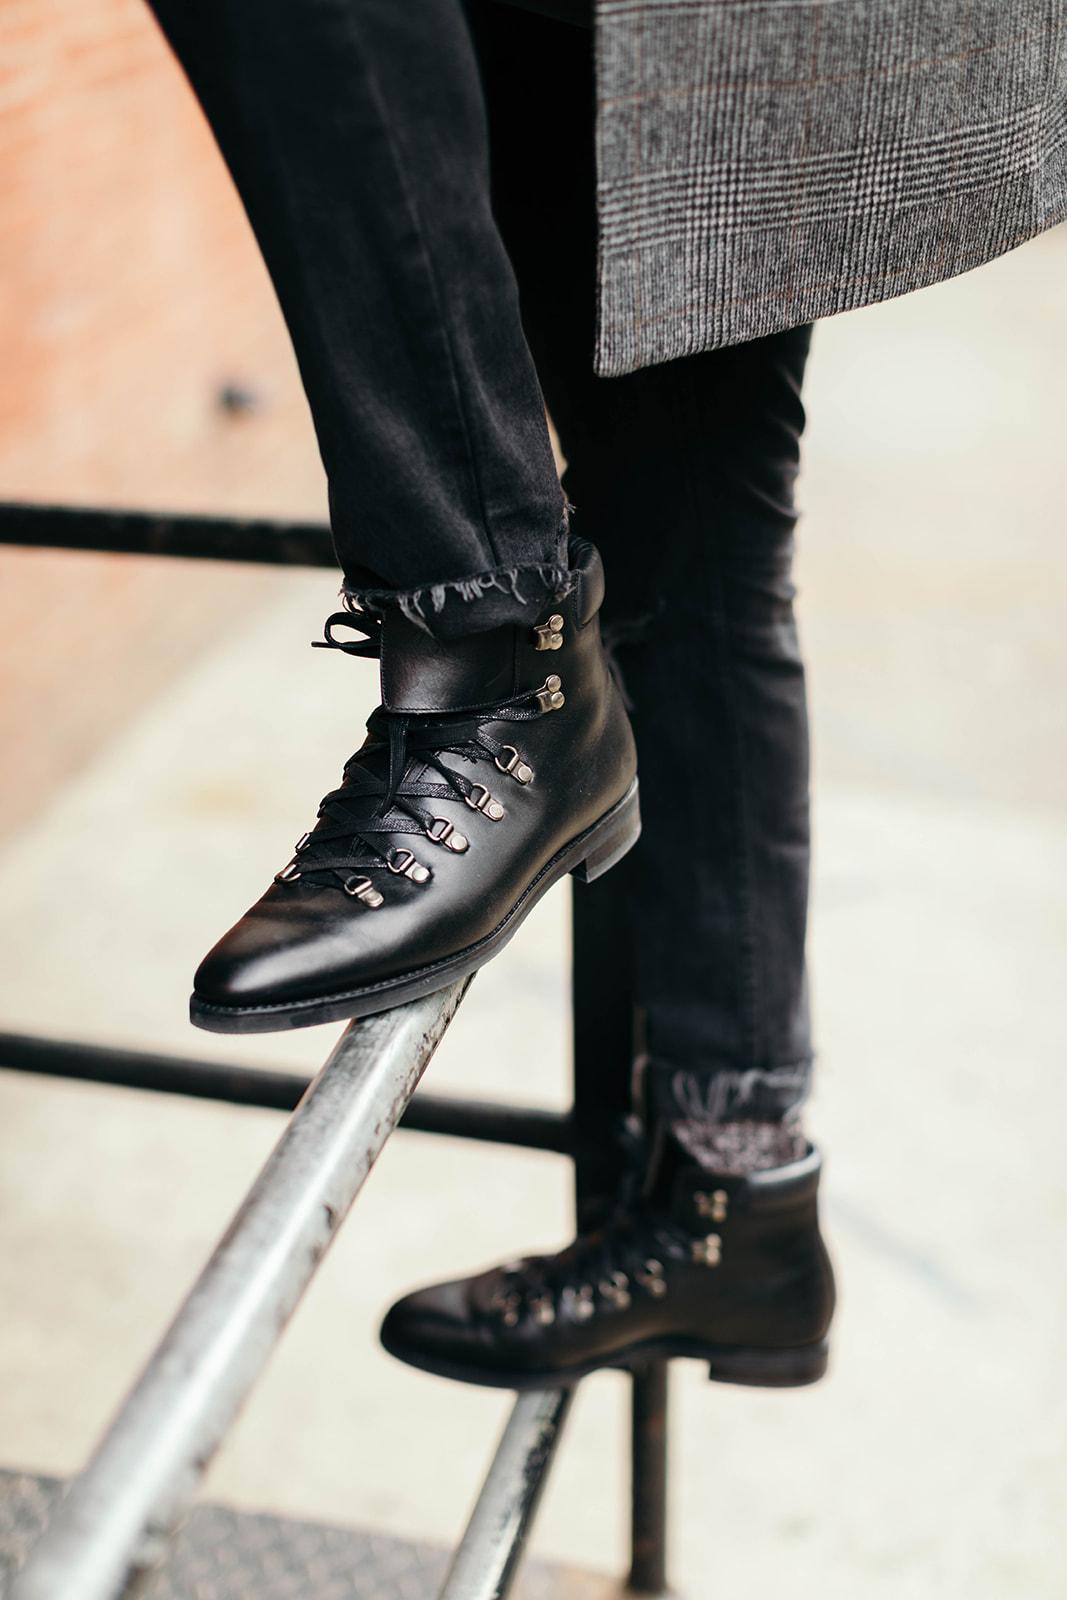 Sabir M. Peele in J.Fitzpatrick Snoqualmie Black Boots